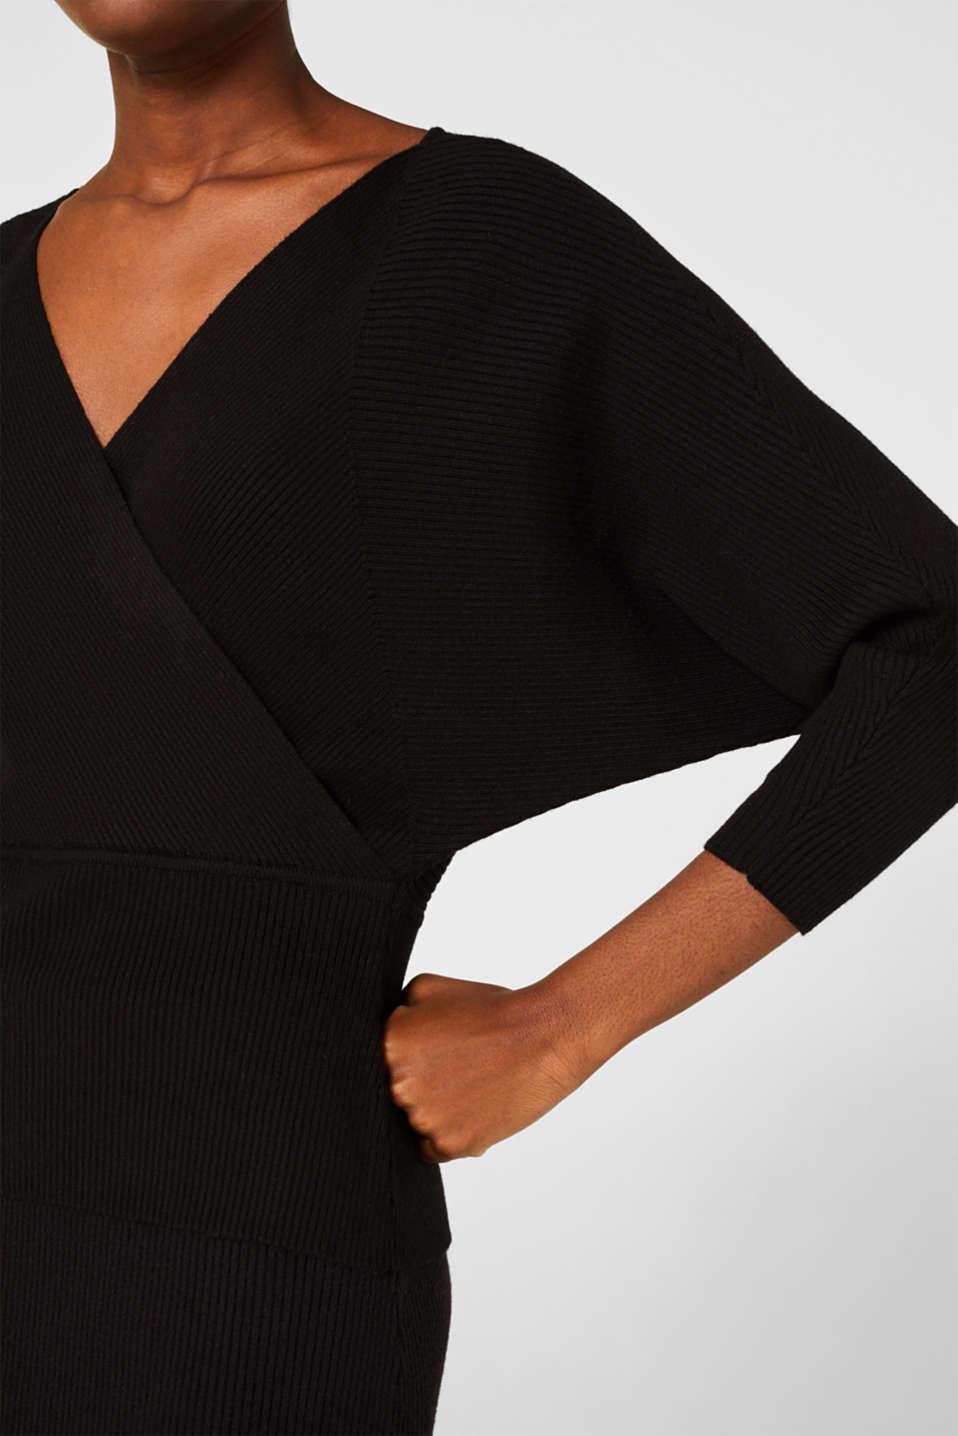 Wrap jumper with batwing sleeves, BLACK, detail image number 2